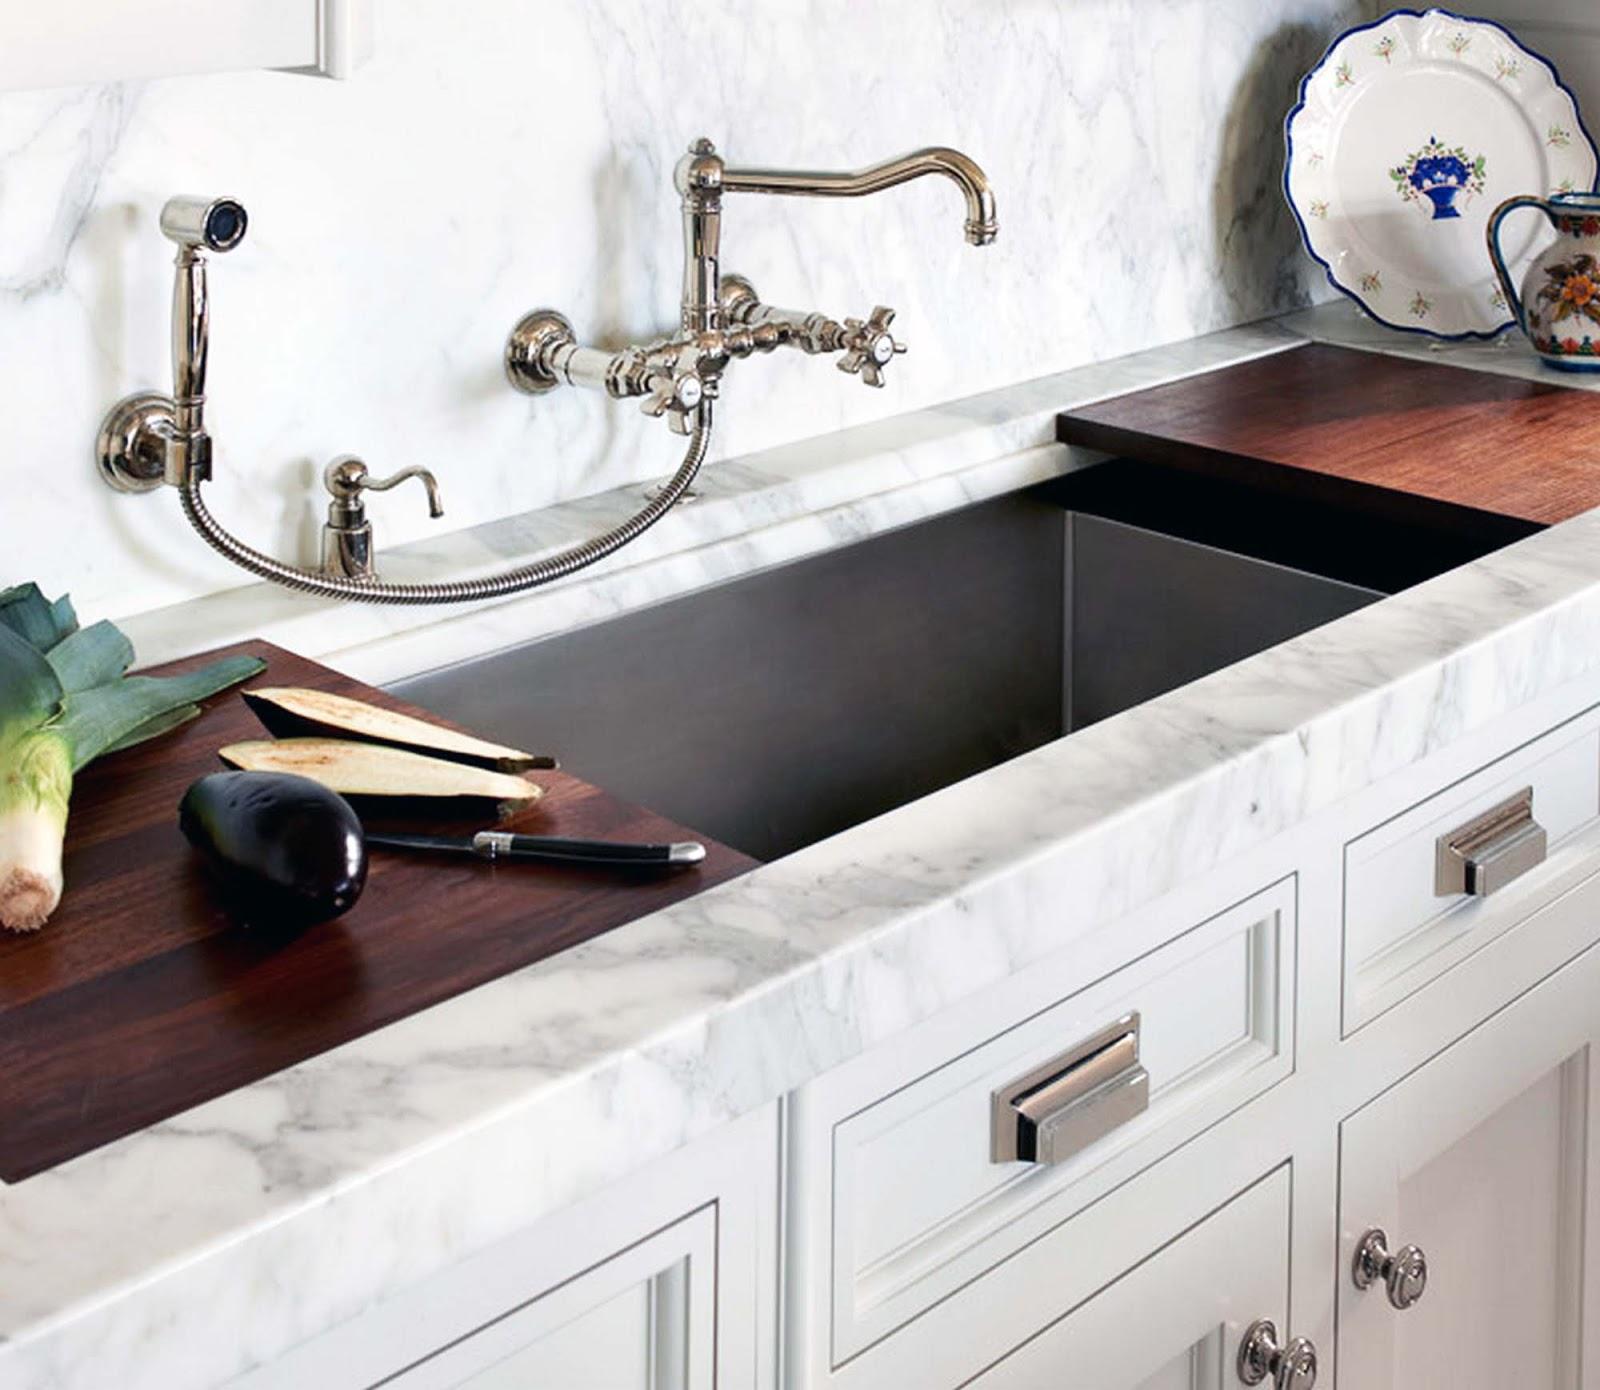 Picking Nice Wall Mount Kitchen Faucet - Ellecrafts